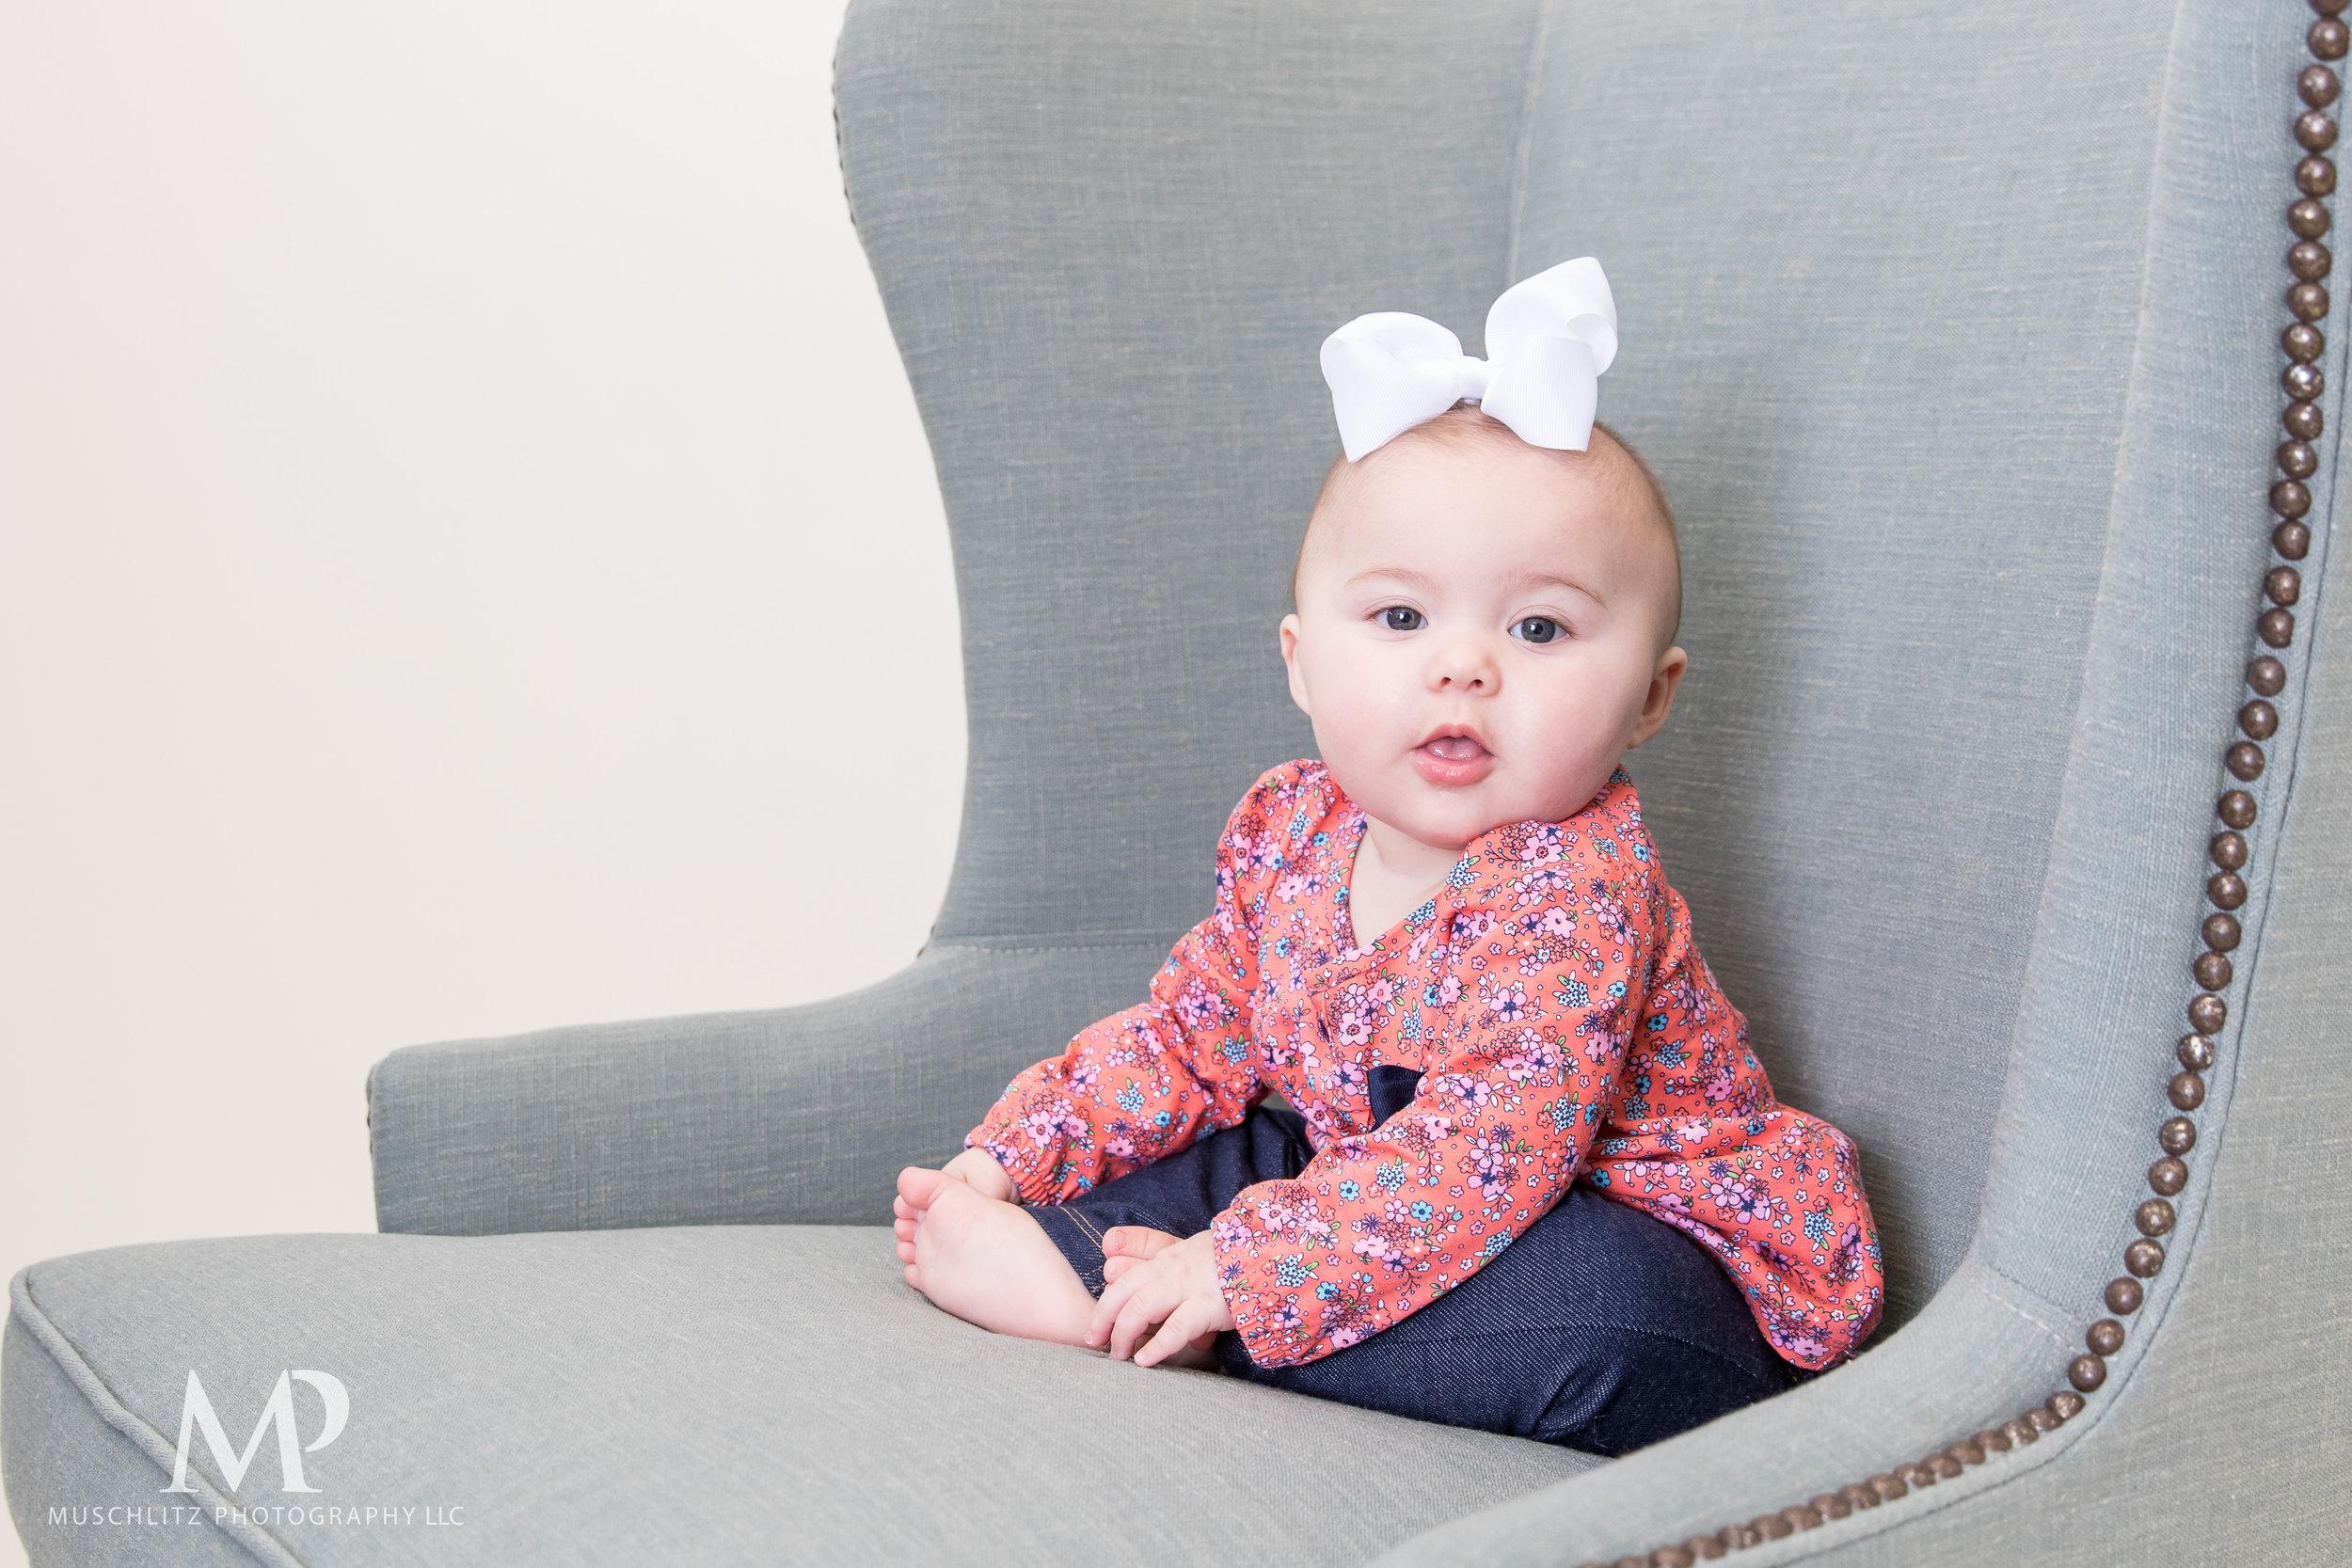 6-month-portraits-baby-photographer-columbus-ohio-gahanna-muschlitz-photography-012.JPG